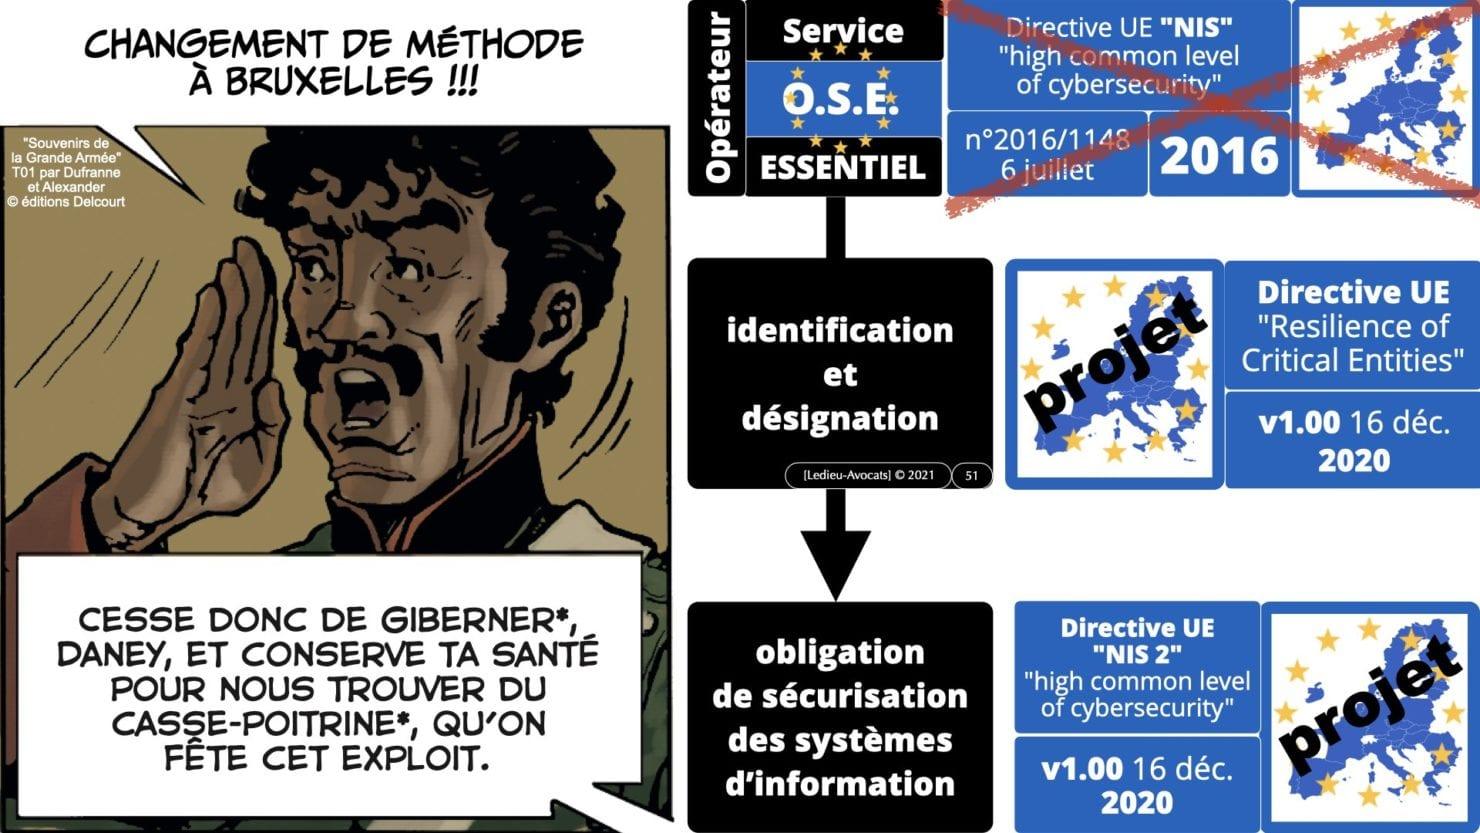 337 cyber sécurité #1 OIV OSE Critical Entities © Ledieu-avocat 15-06-2021.051